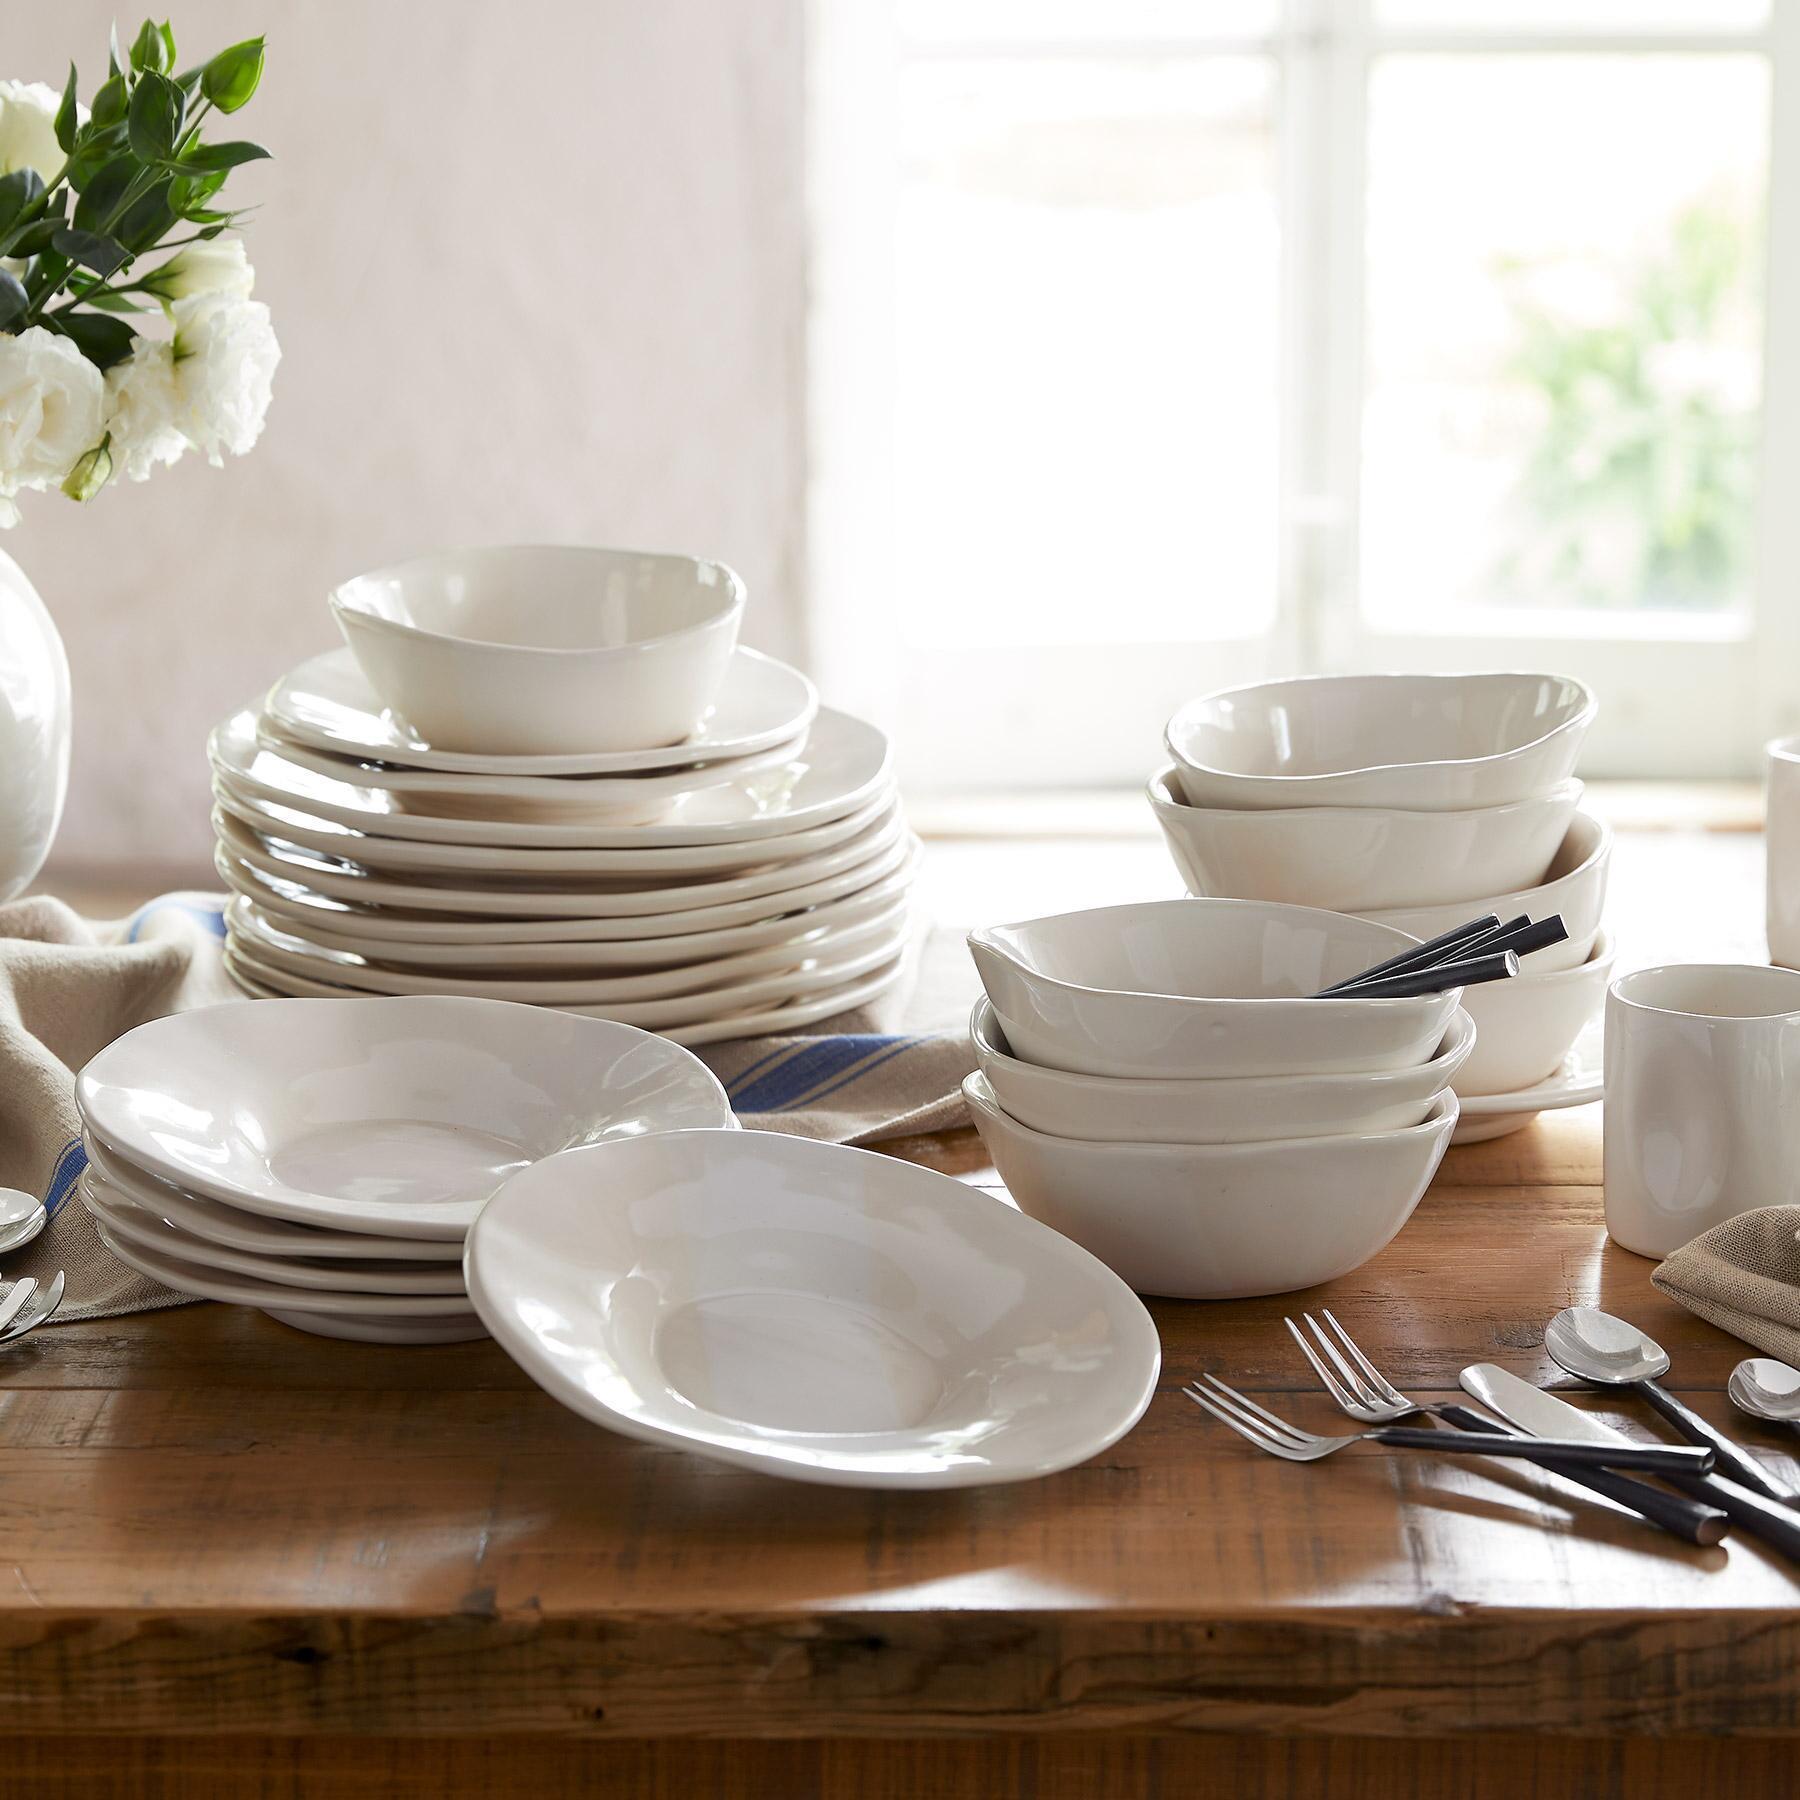 ALEX MARSHALL ORGANIC DINNERWARE, 4-PIECE PLACE SETTING: View 2